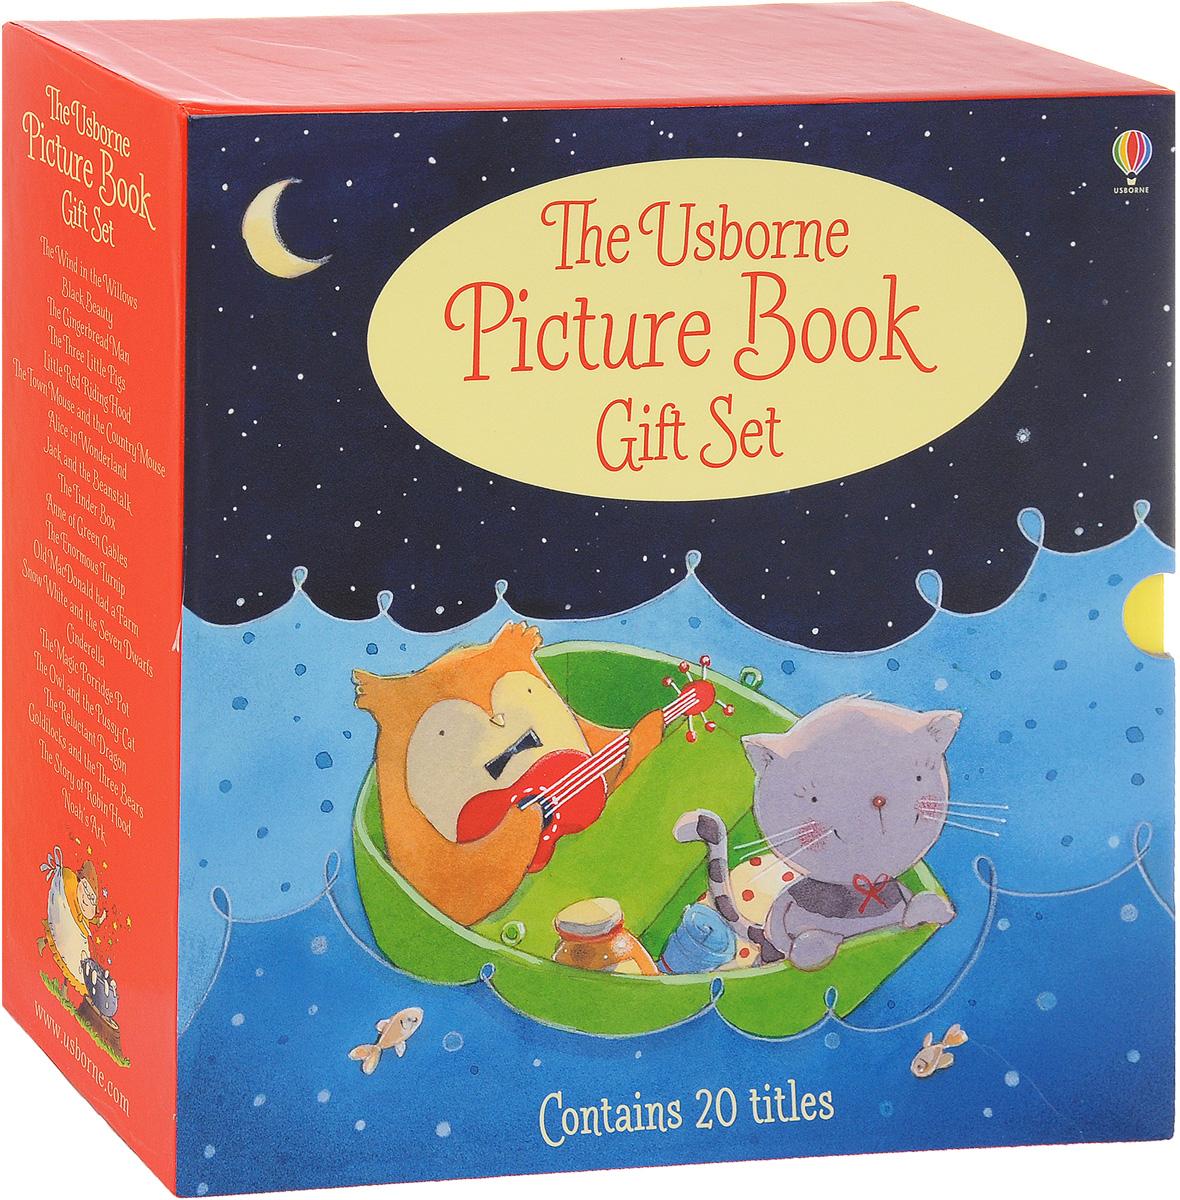 The Usborne Picture Book Gift Set (комплект из 20 книг) under one cover eleven stories